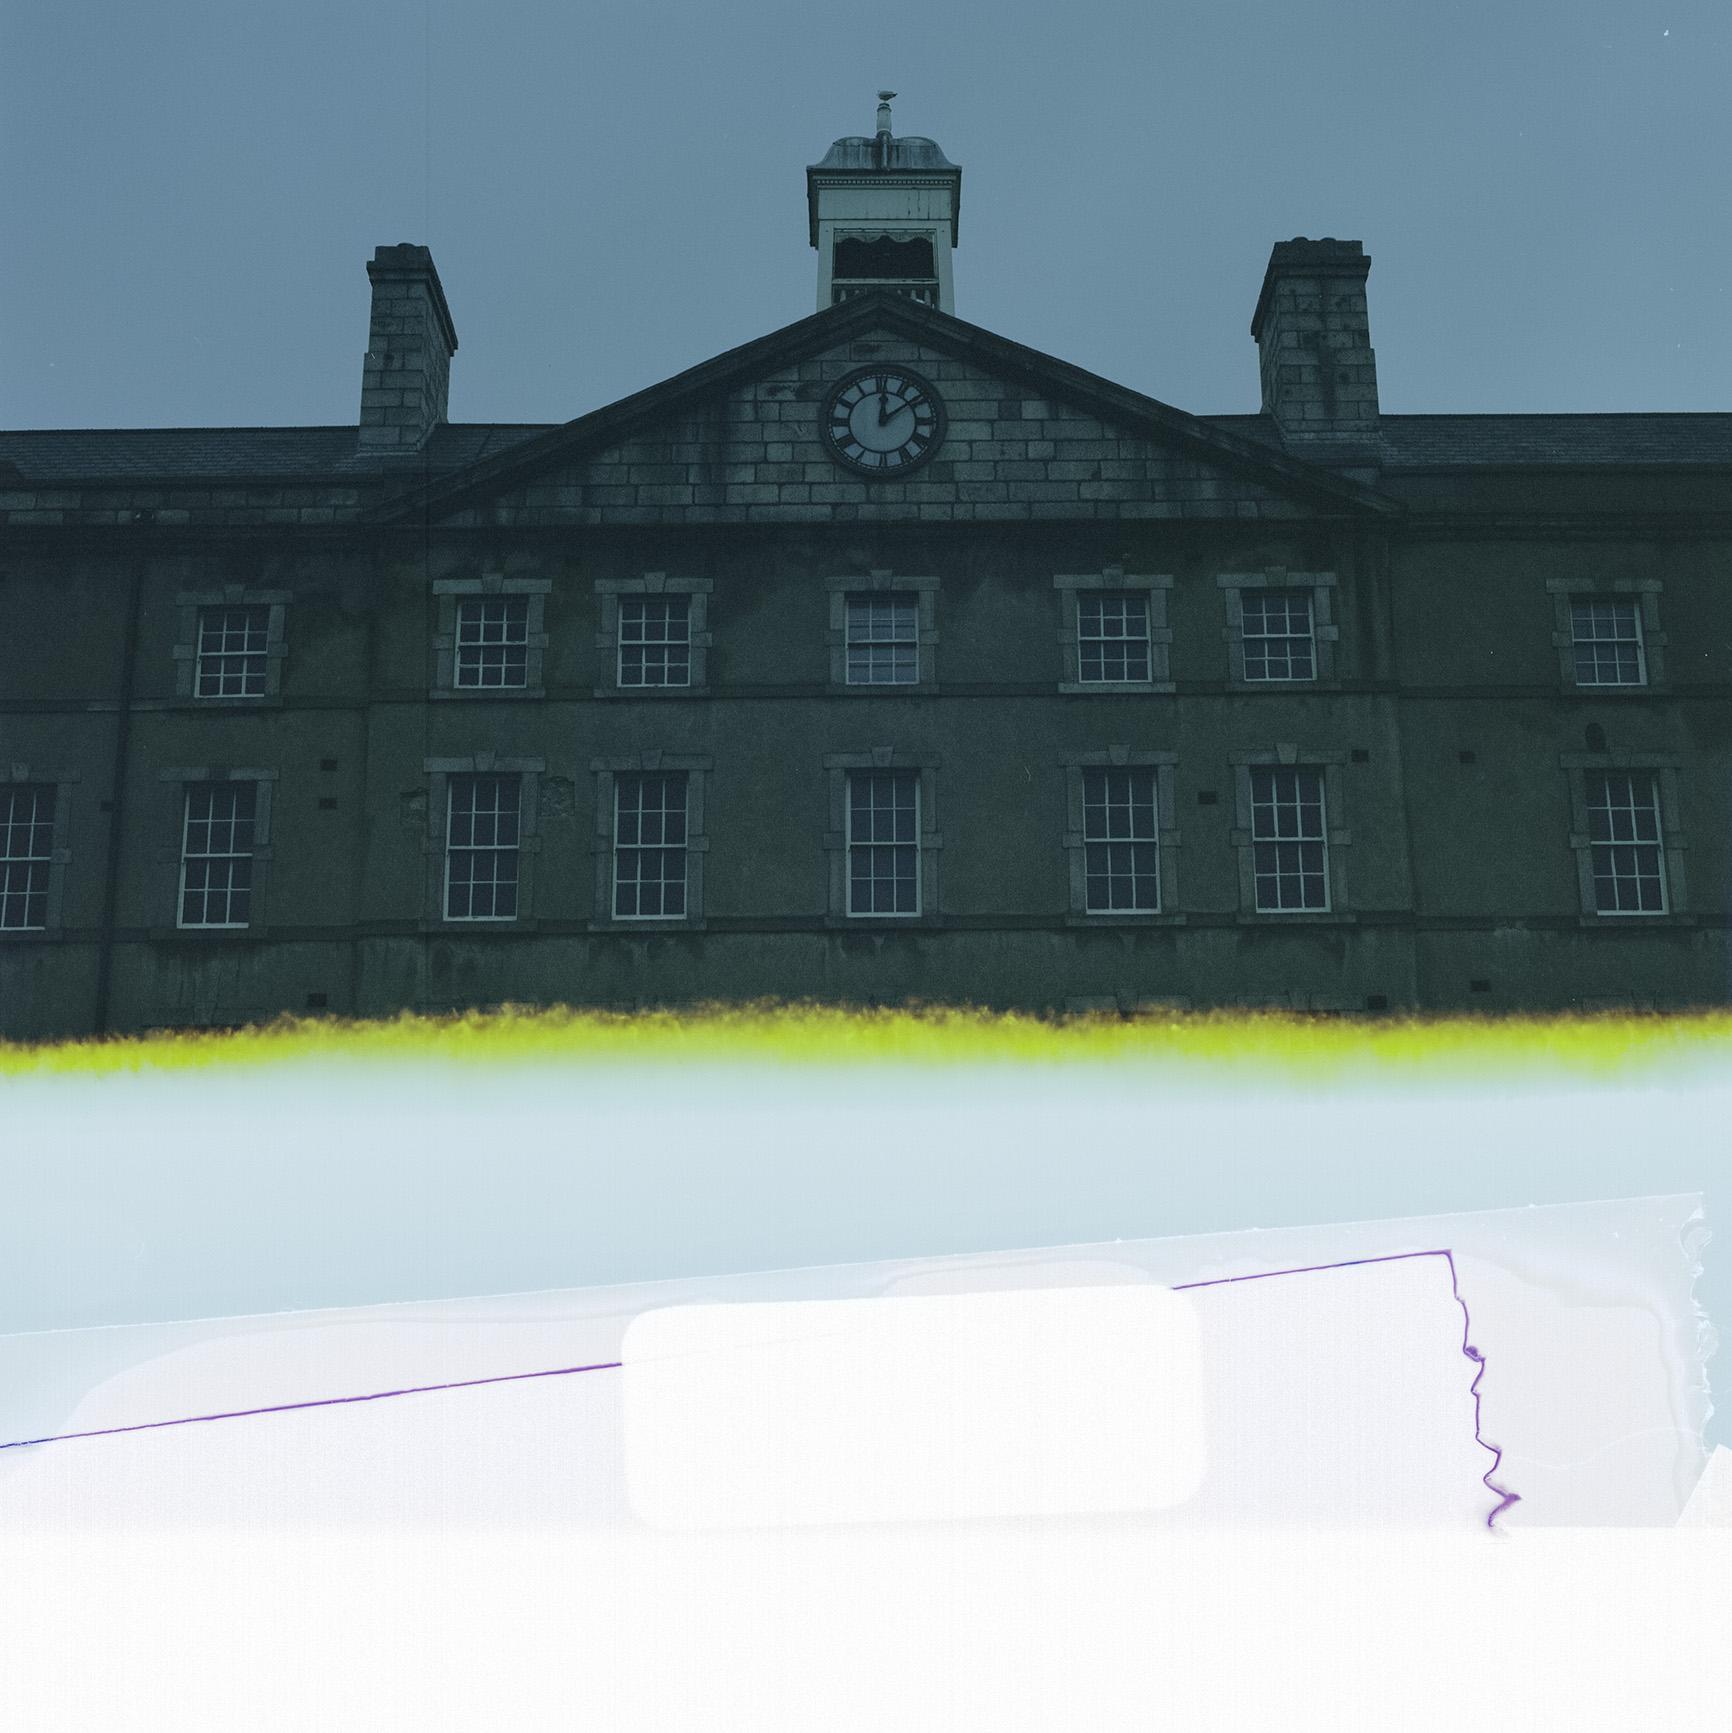 Camera: Hasselblad 500C/M  Film: Kodak Portra 400  Location: Collins Barracks, Dublin, Ireland